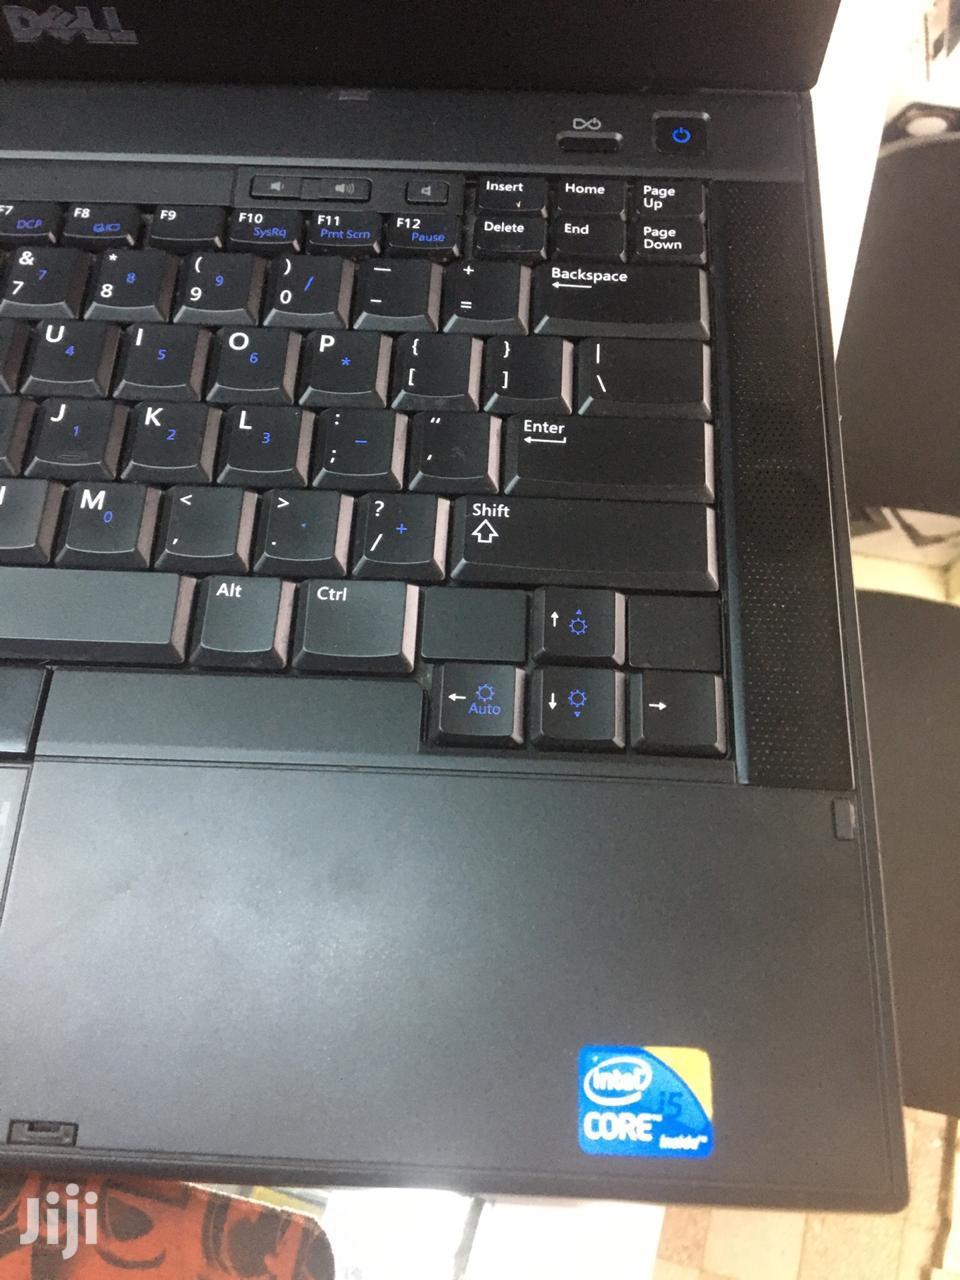 Laptop Dell Latitude E6410 4GB Intel Core I5 HDD 320GB | Laptops & Computers for sale in Kilimani, Nairobi, Kenya